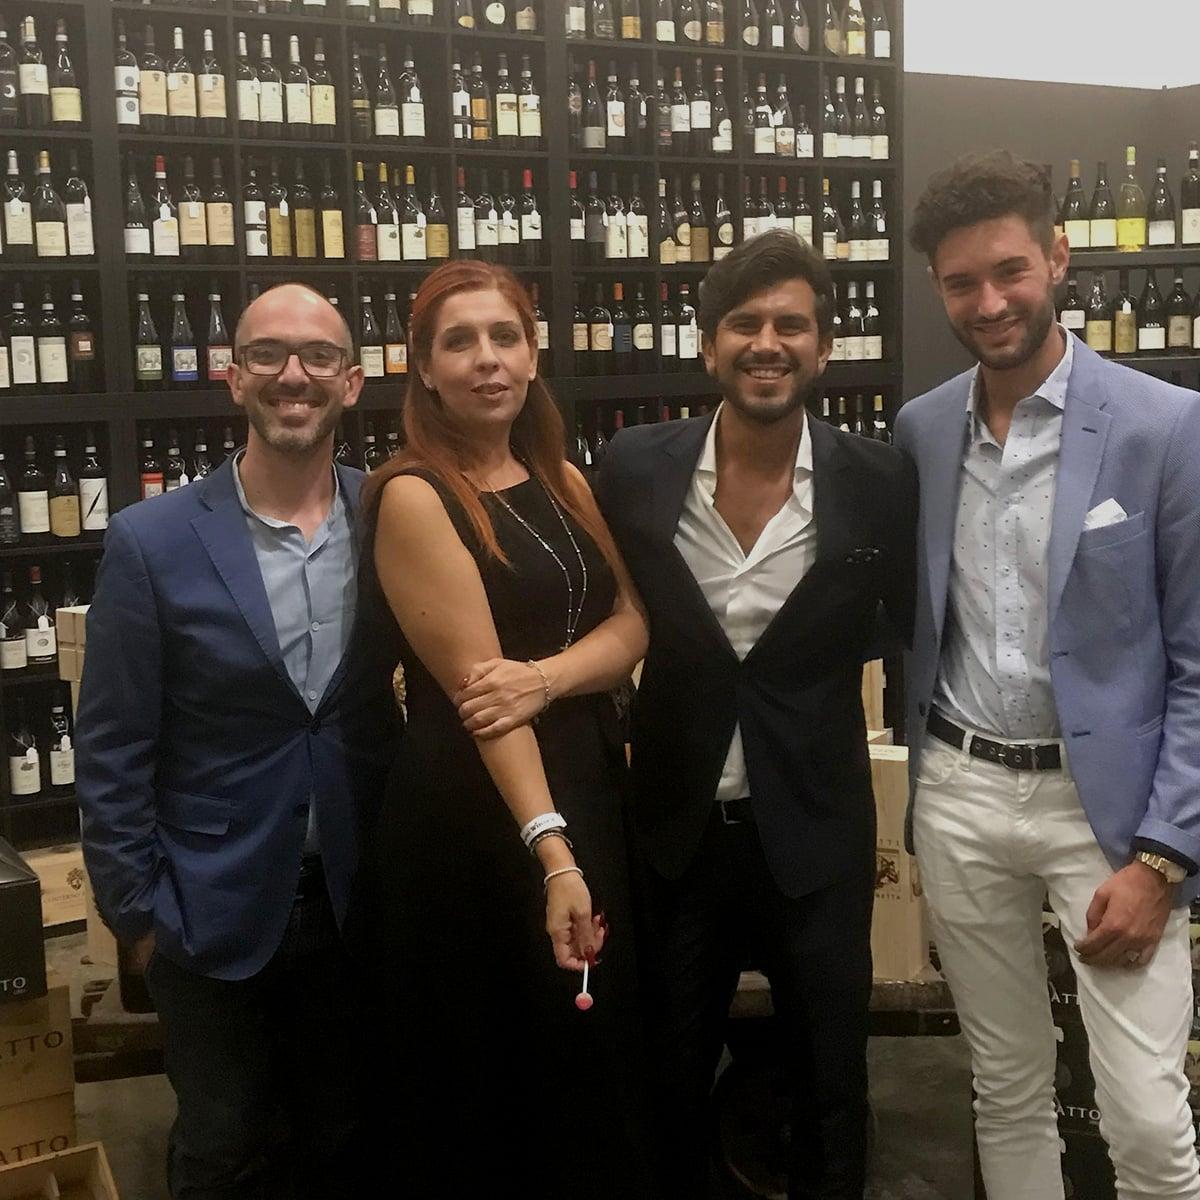 personal-winer-torino-contemporaneo-food-vino